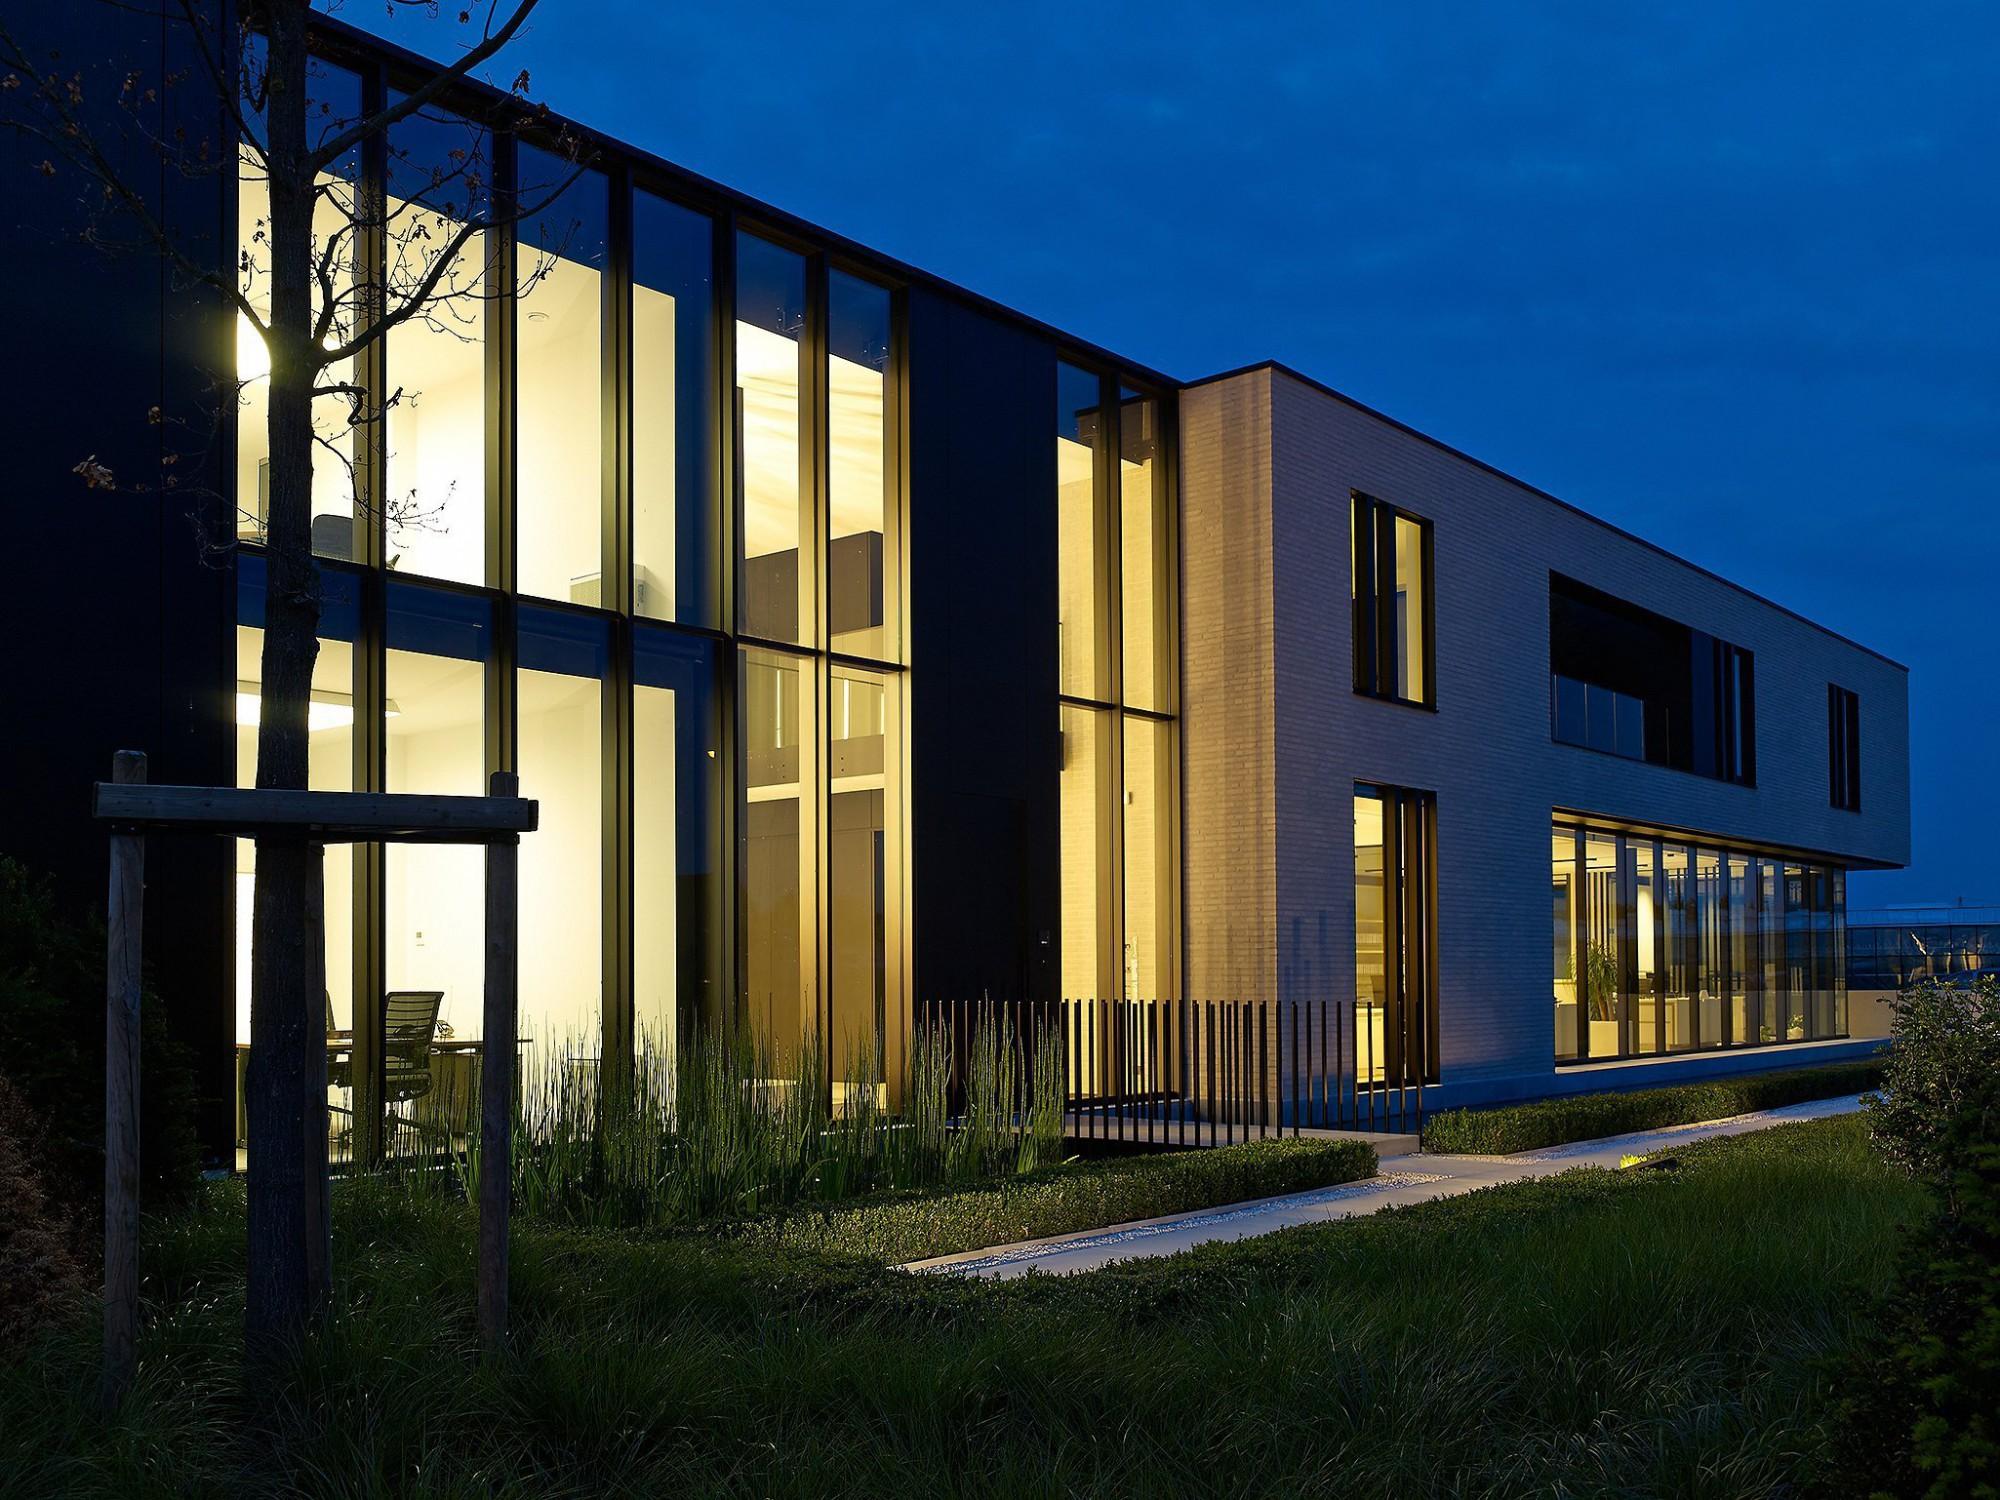 Afbeelding: Architectuur fotografie, kantoorgebouw Turnhout, voor bouwonderneming Fransen.